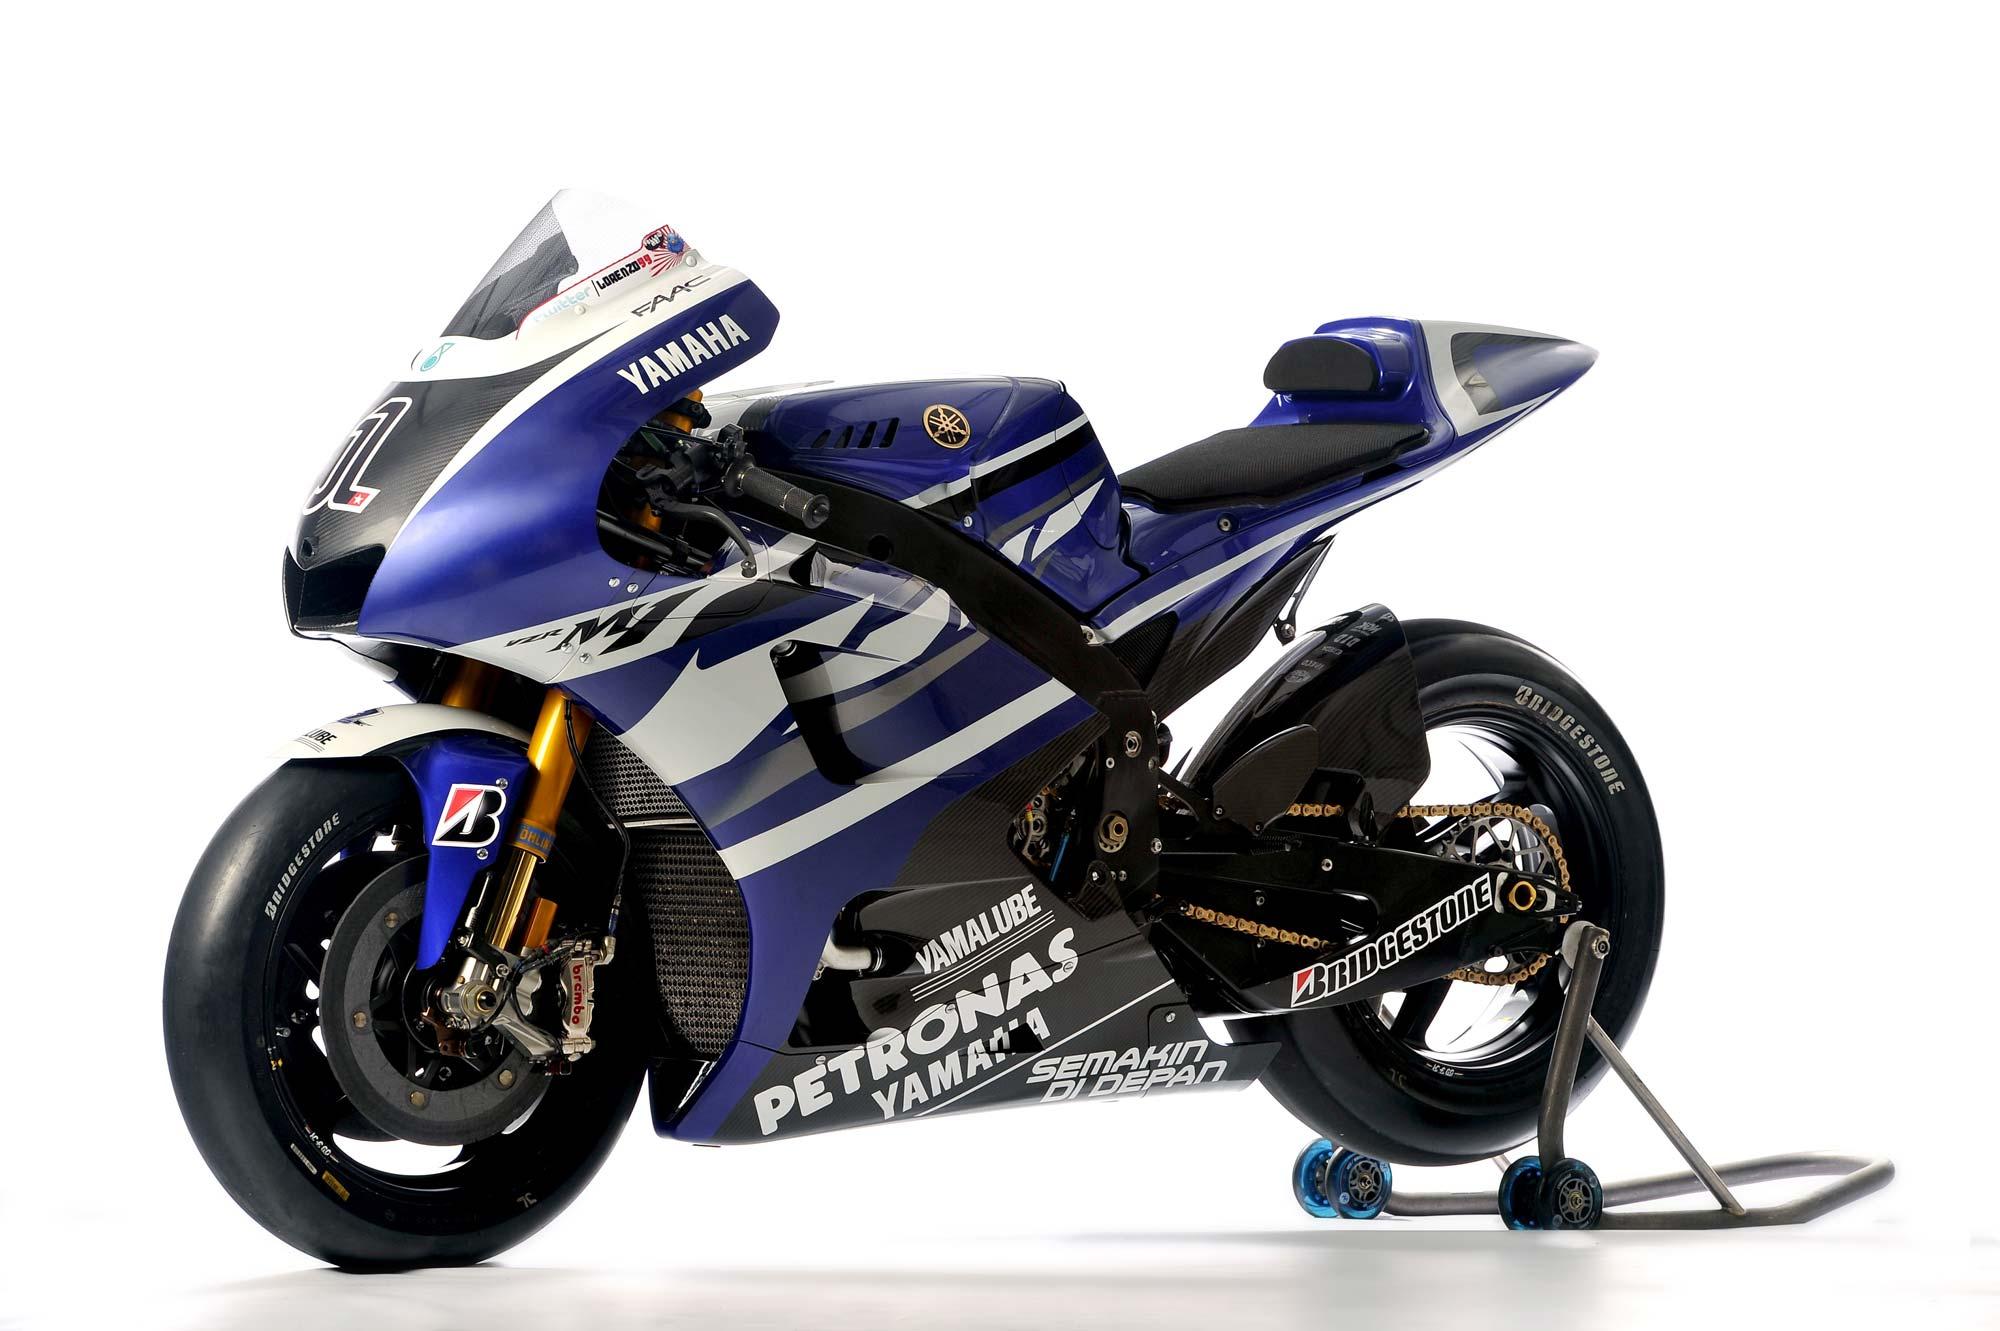 World Automotive Center: 2011 MOTOGP - Yamaha YZR-M1 Lorenzo/Spies